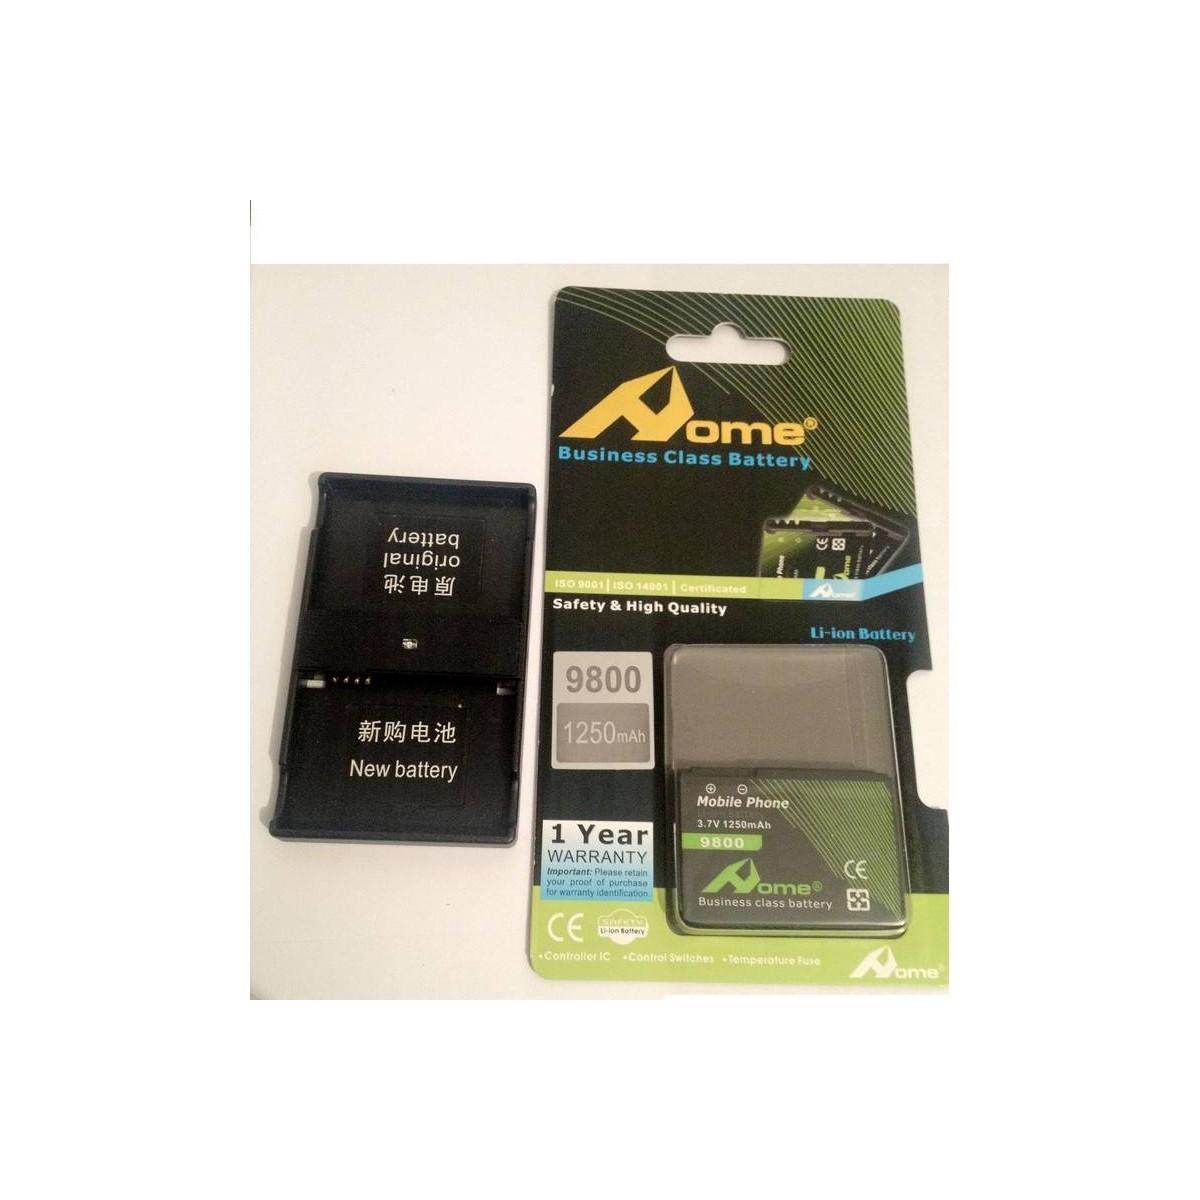 Bateria para BlackBerry Torch 9800, Curve 8910 + adaptador